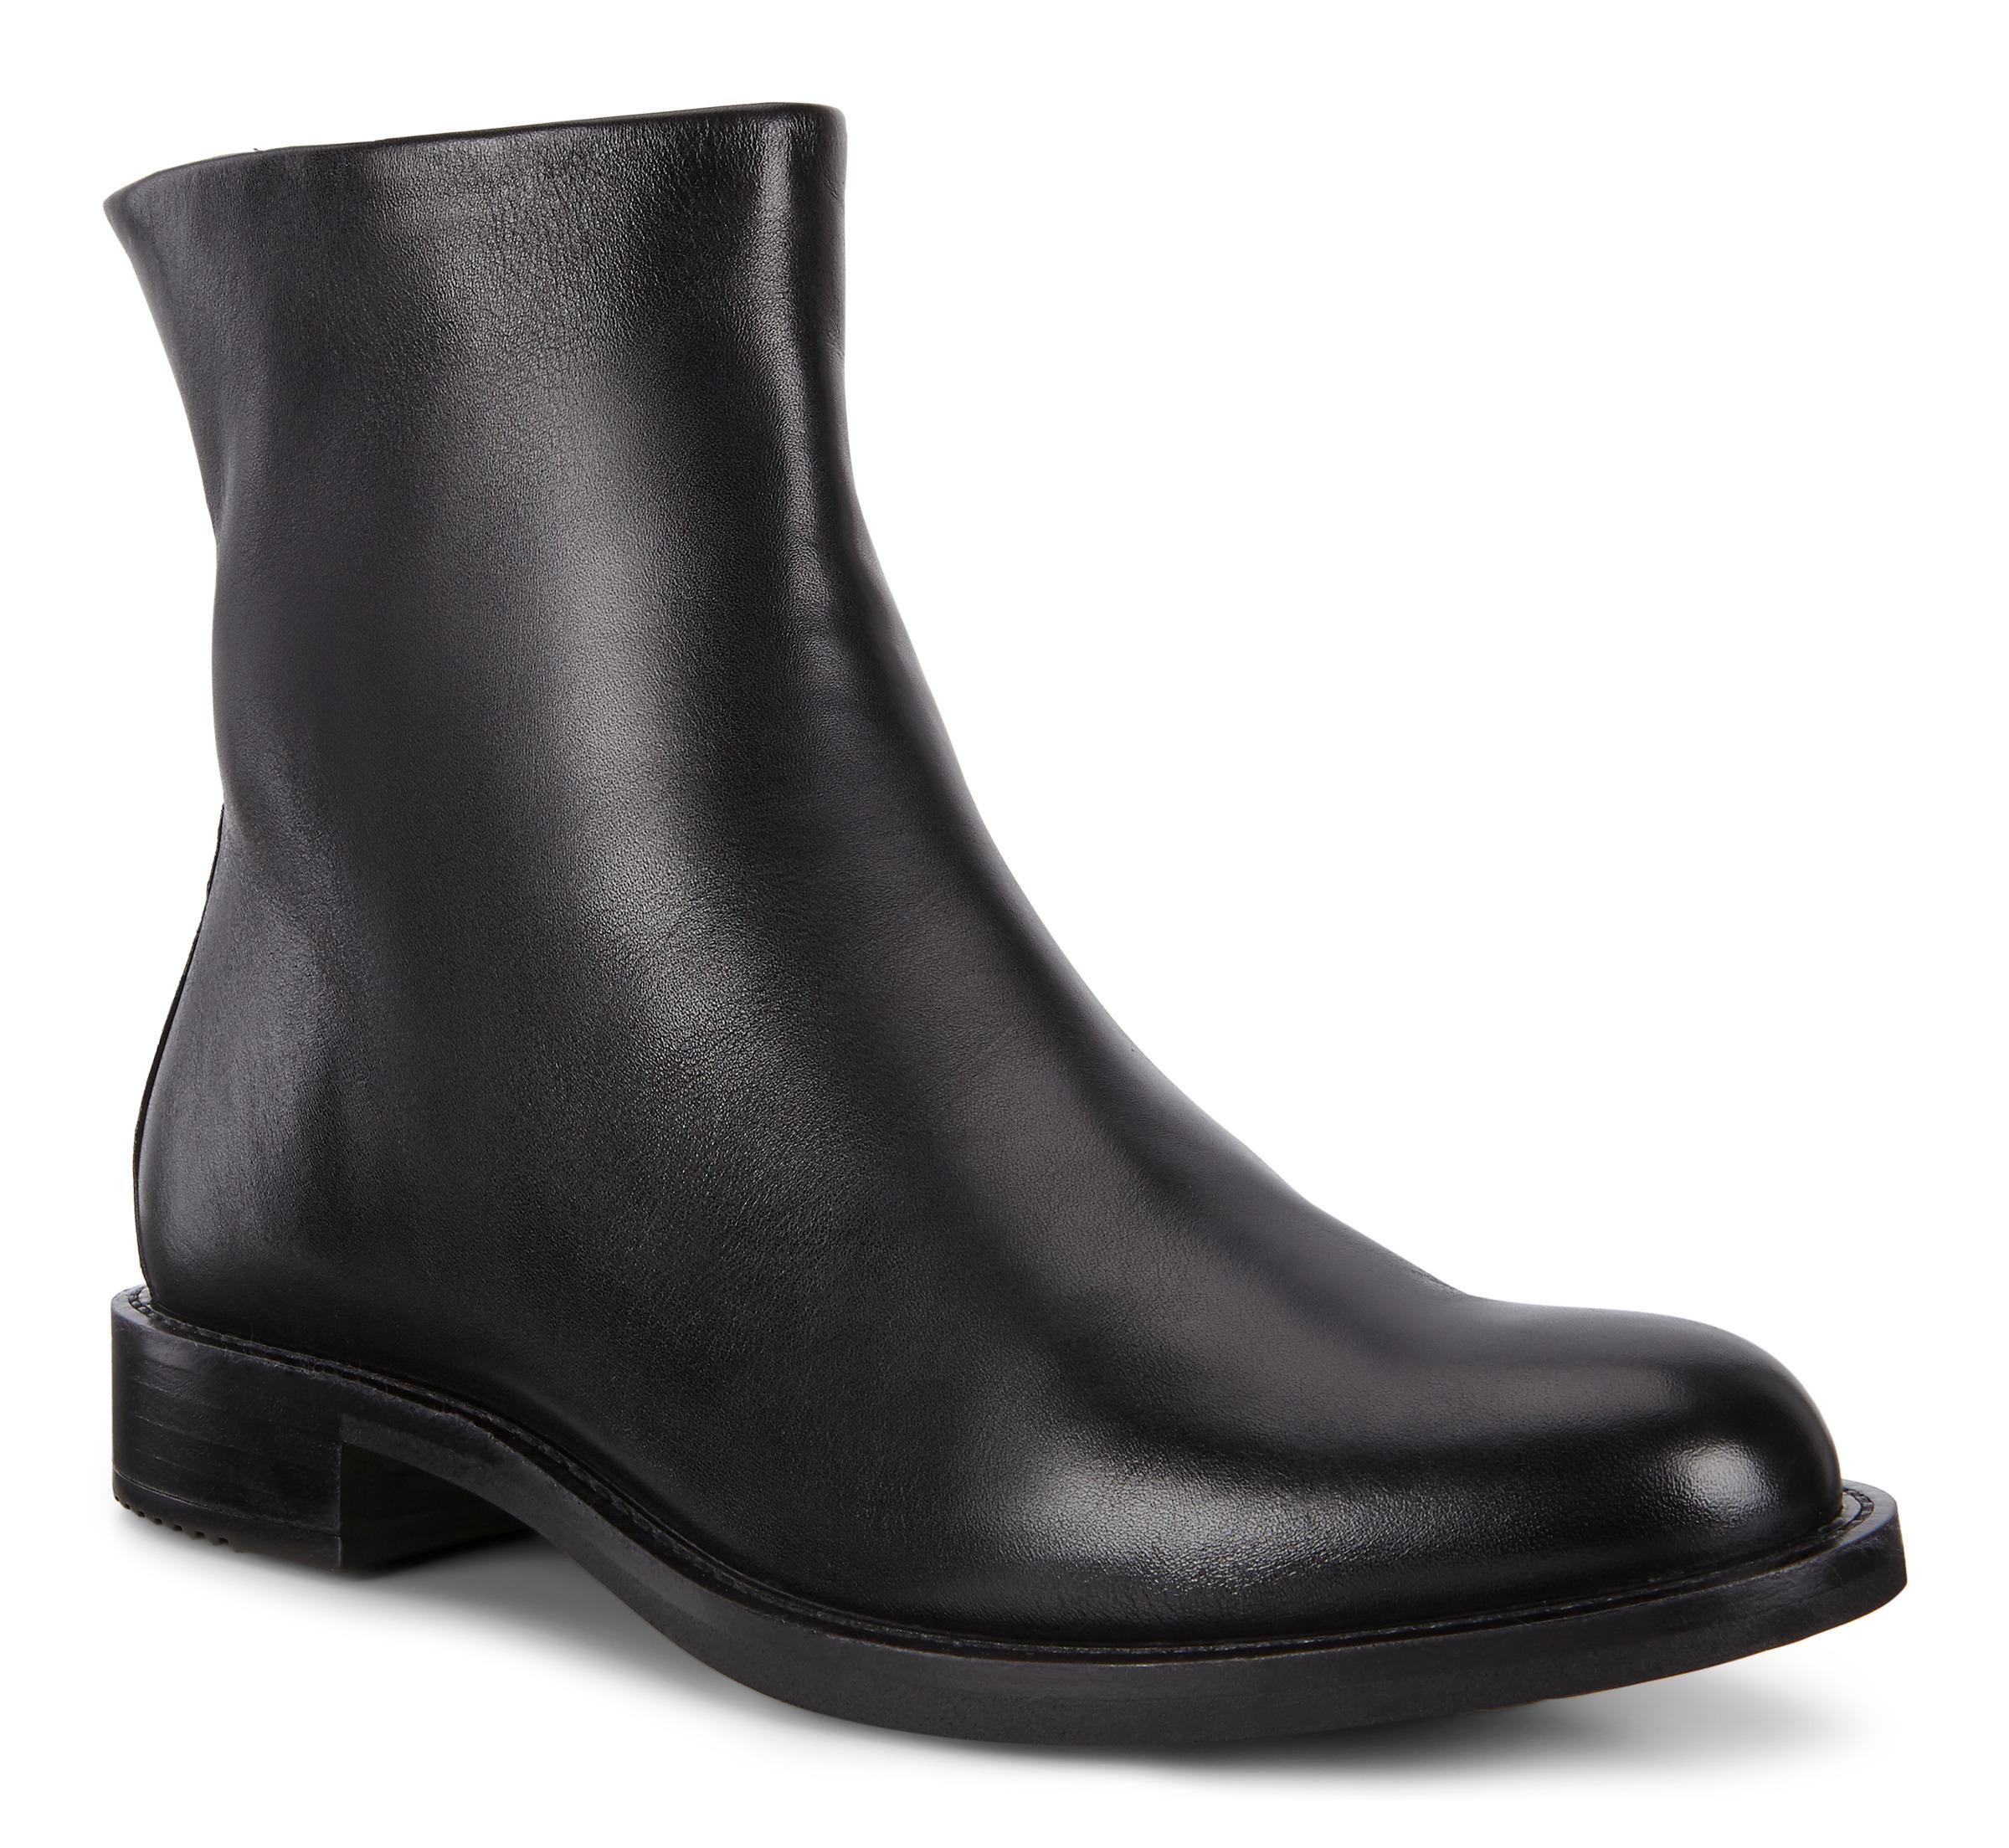 Ecco Sartorelle 25 støvle